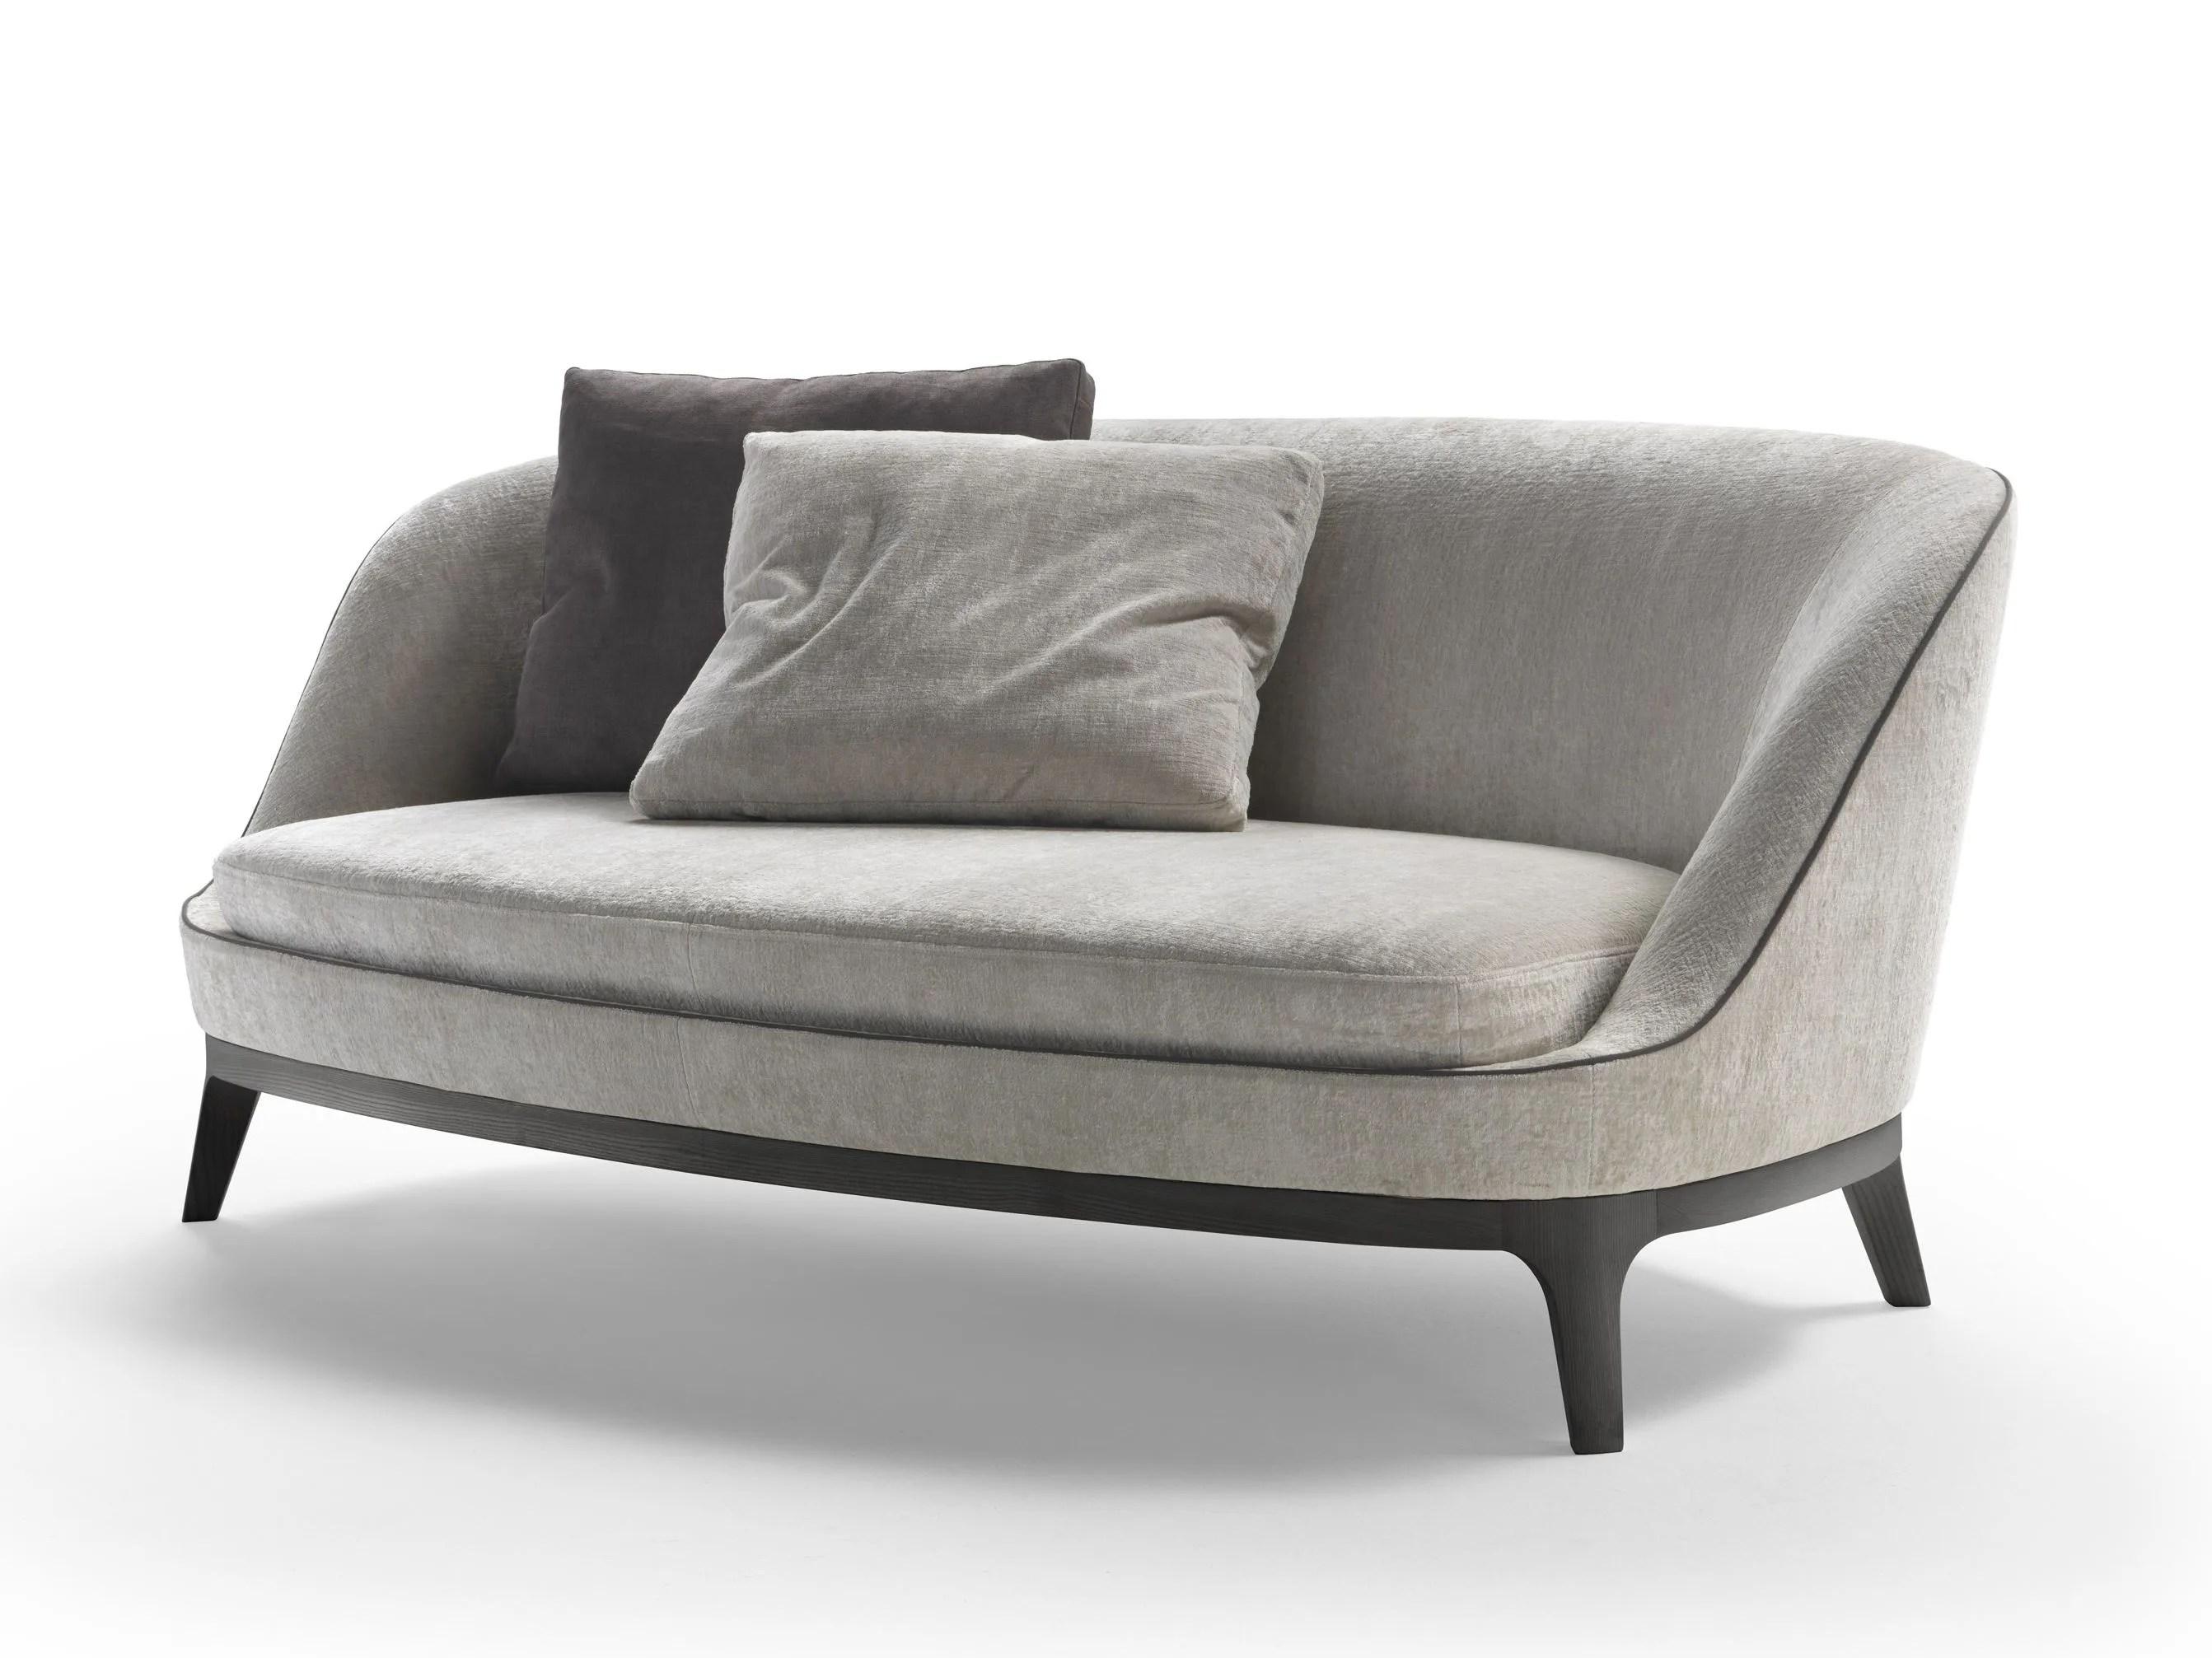 DRAGONFLY  Small sofa By Mood by Flexform design Roberto